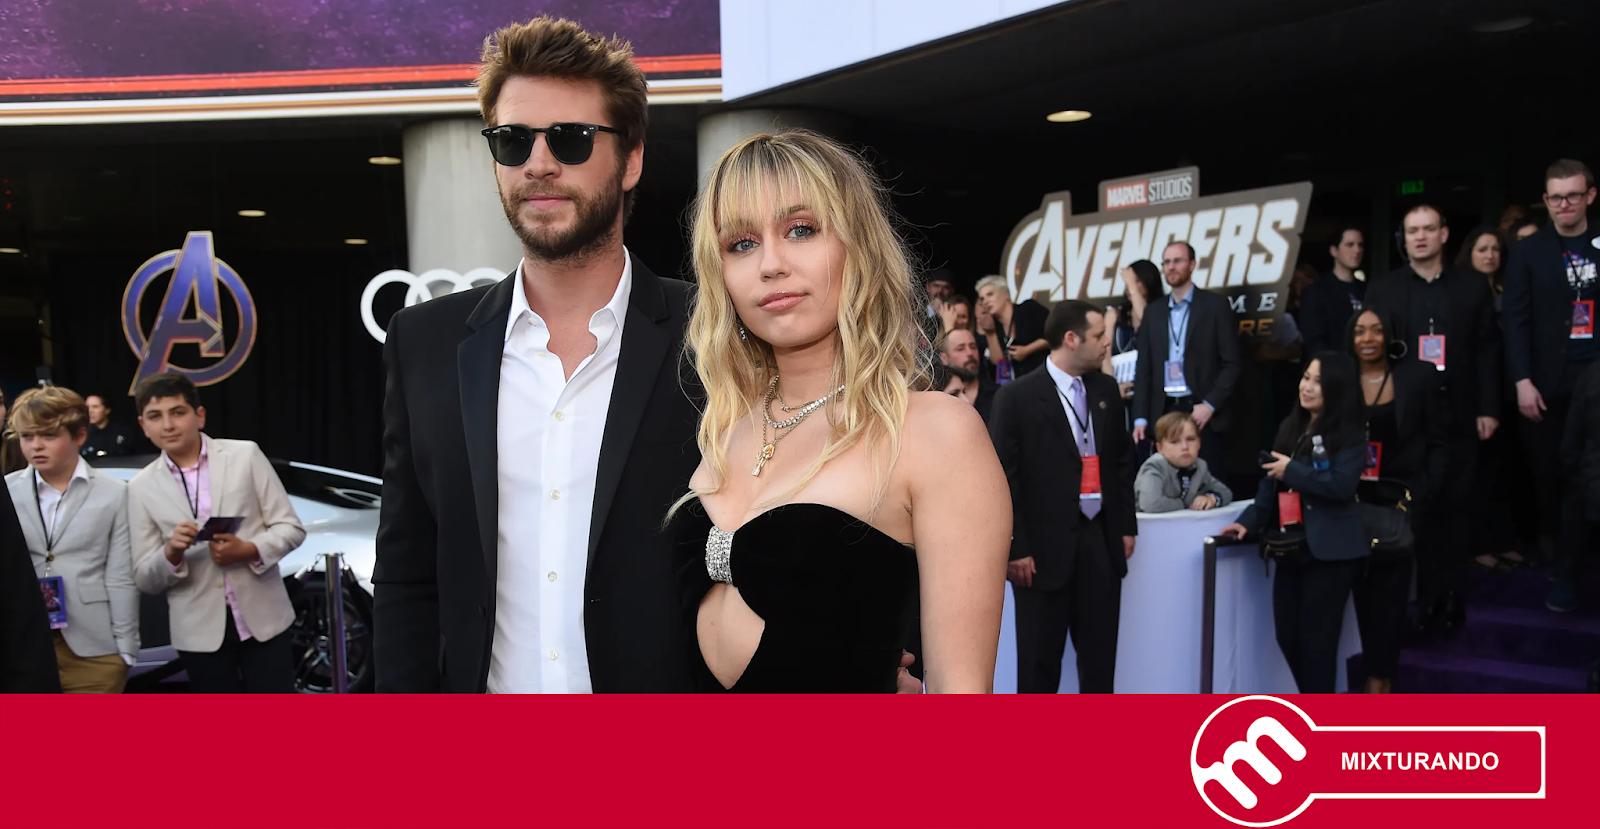 Liam Hemsworth fala publicamente sobre término com Miley Cyrus